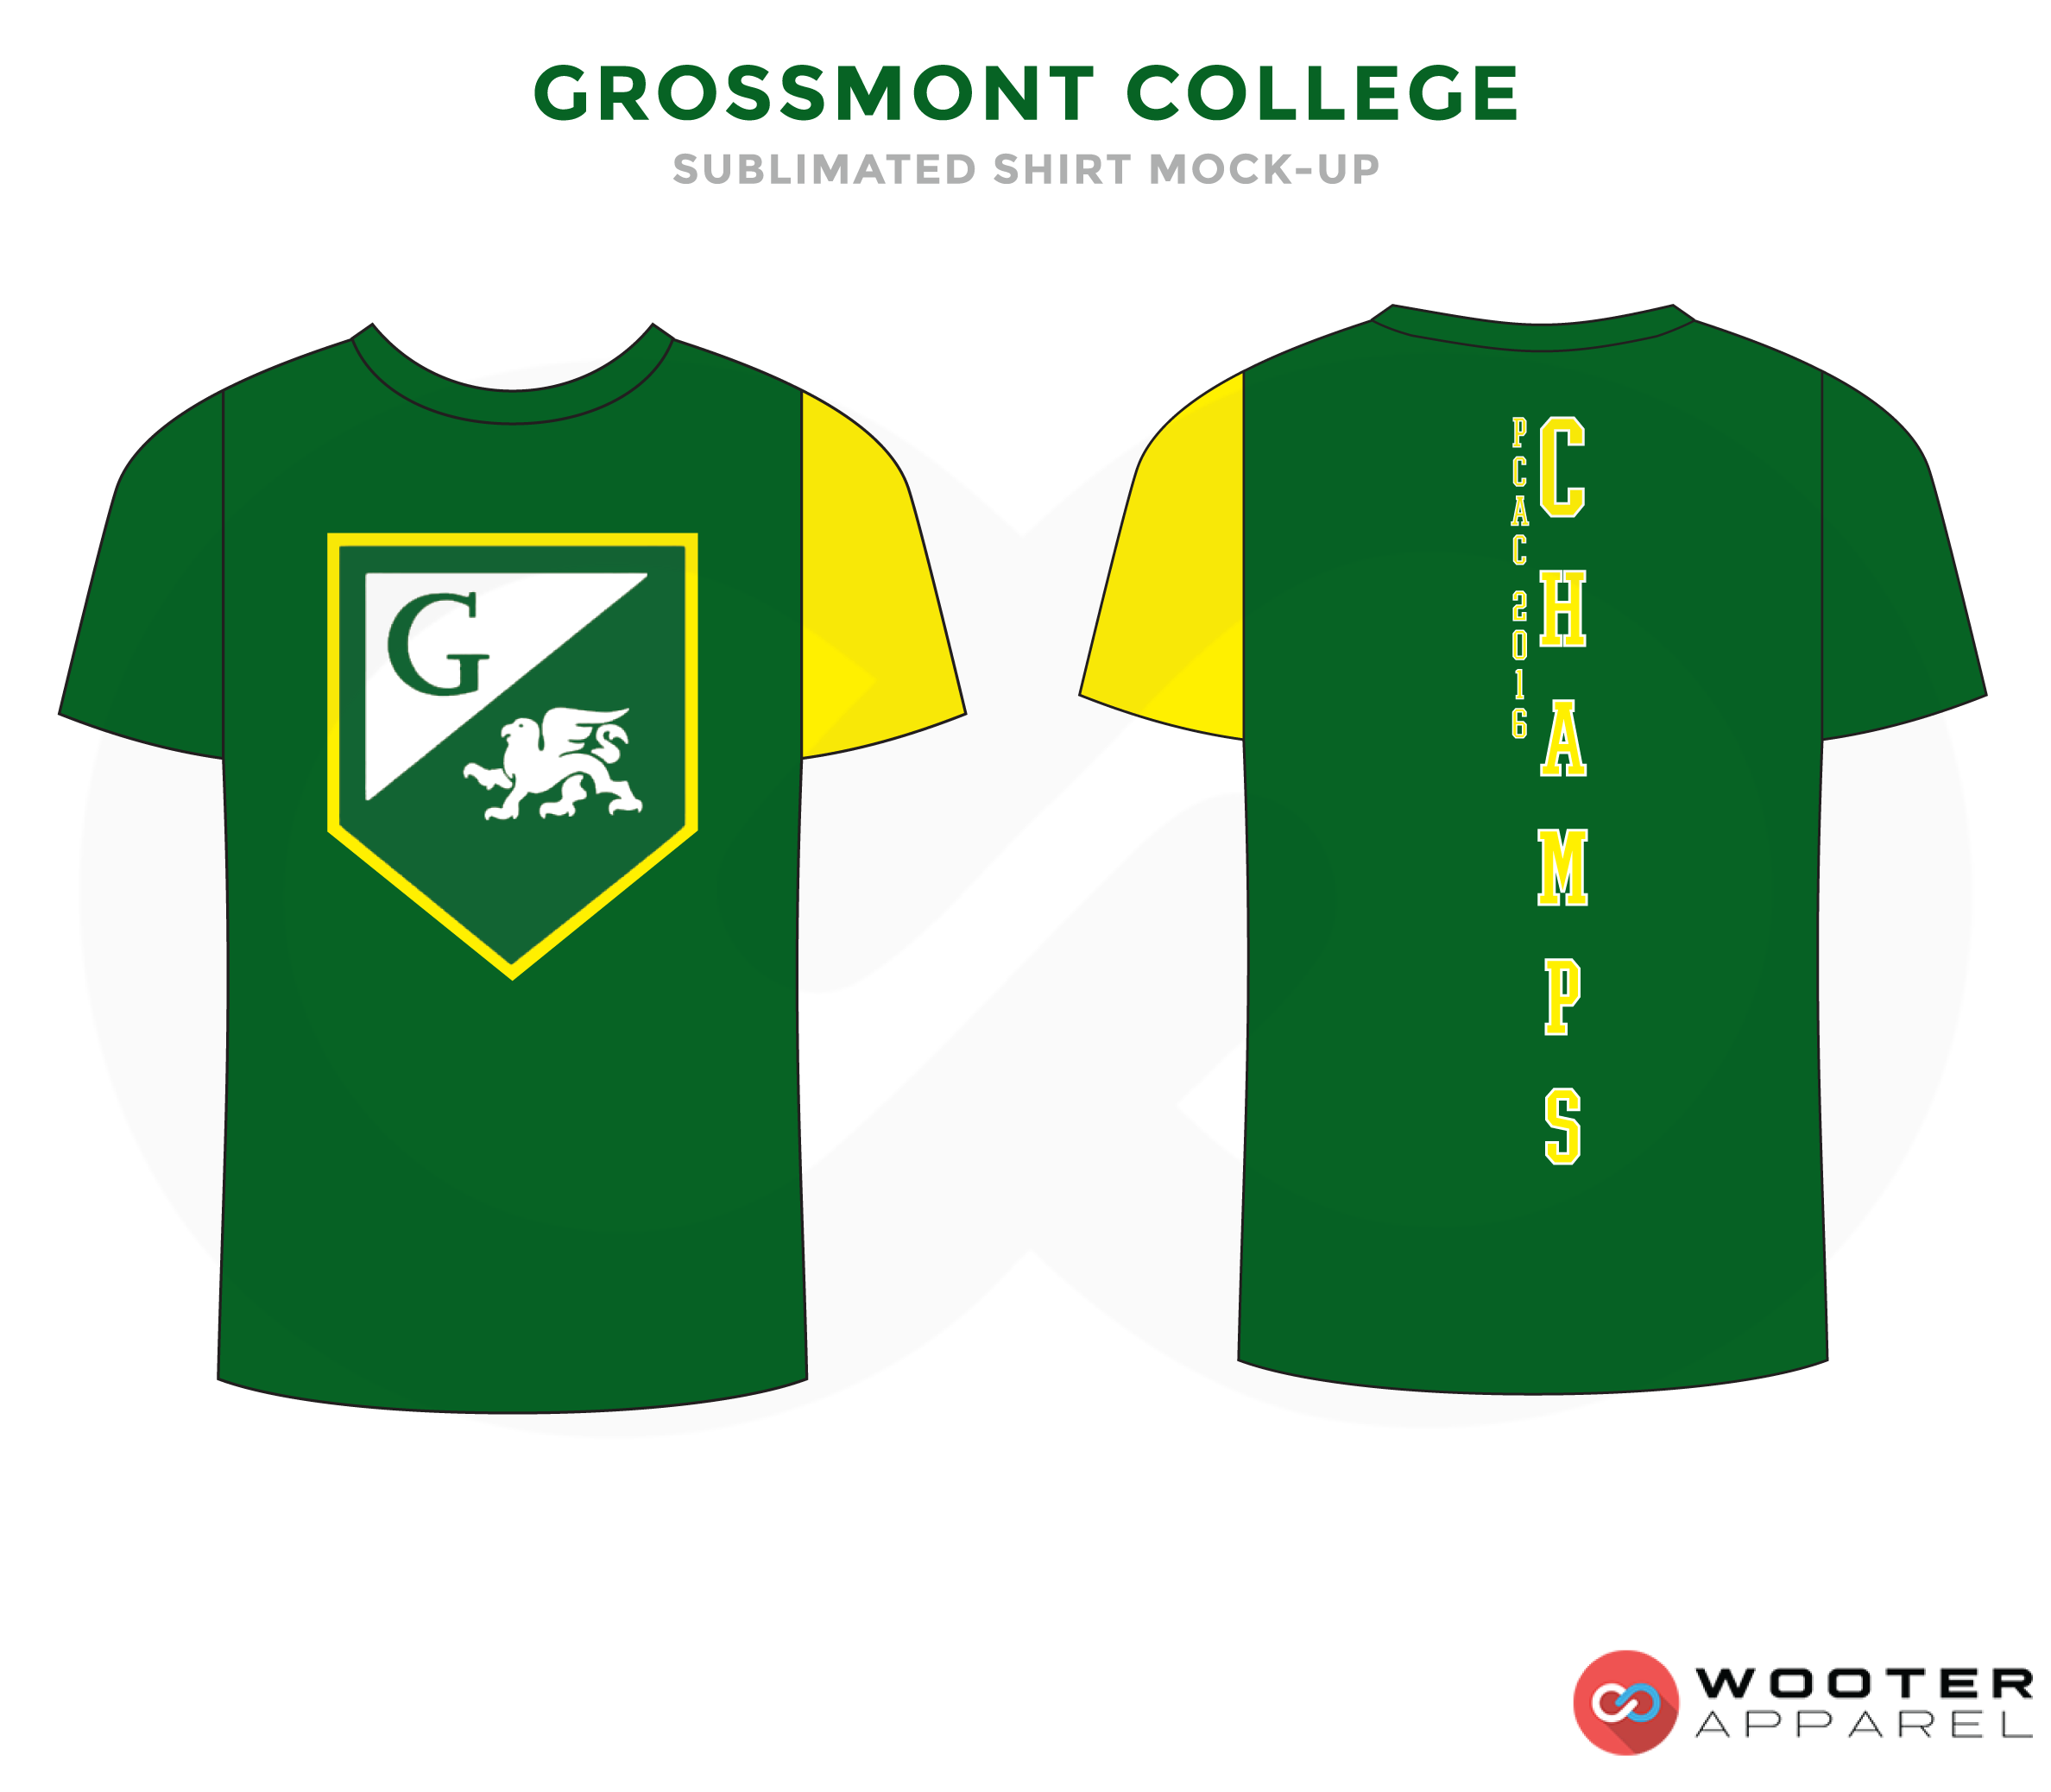 CROSSMONT COLLEGE Green Yellow and White Premium Shooting Shirt